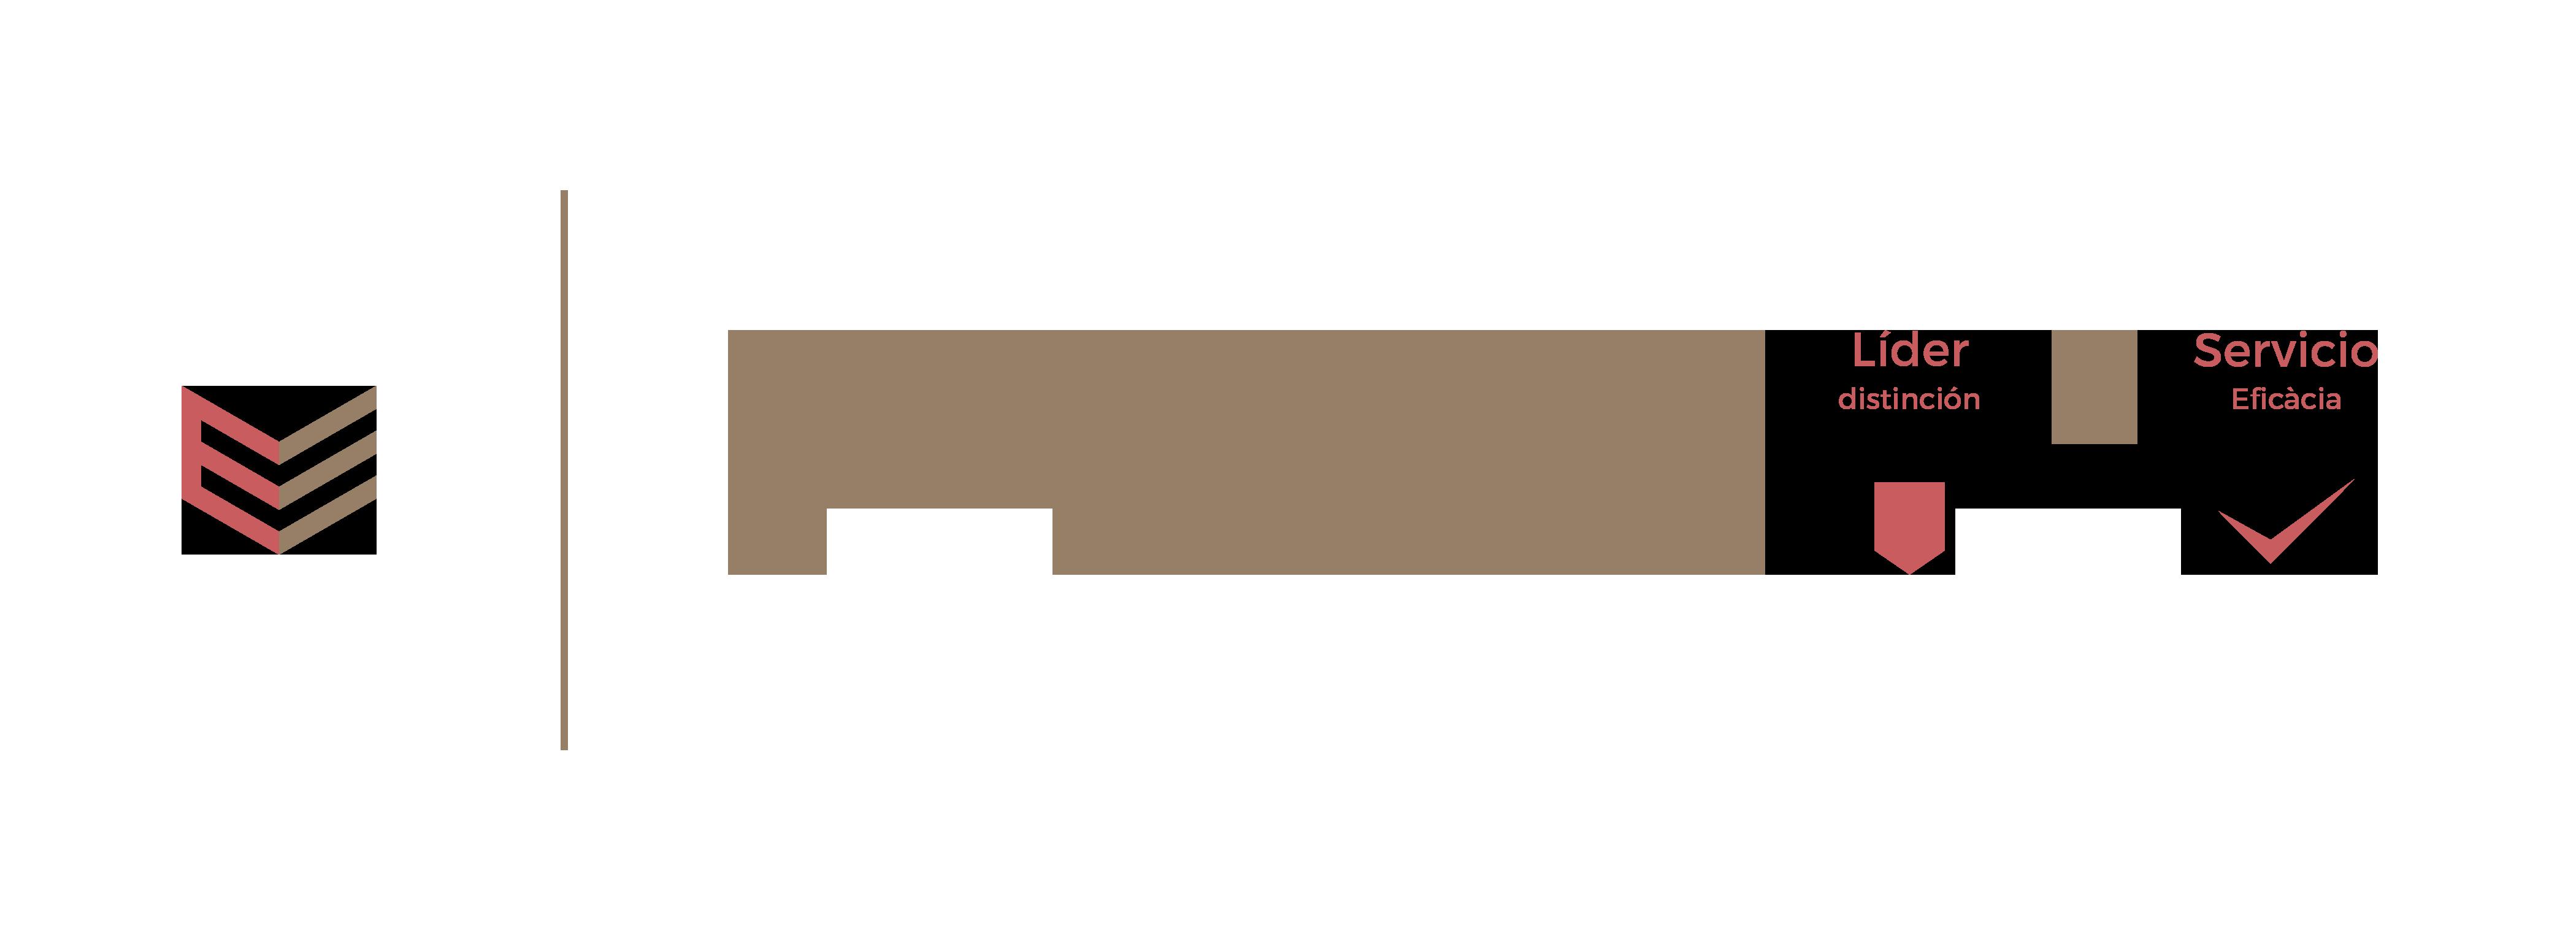 euroembalaje corporativo logo-embalaje